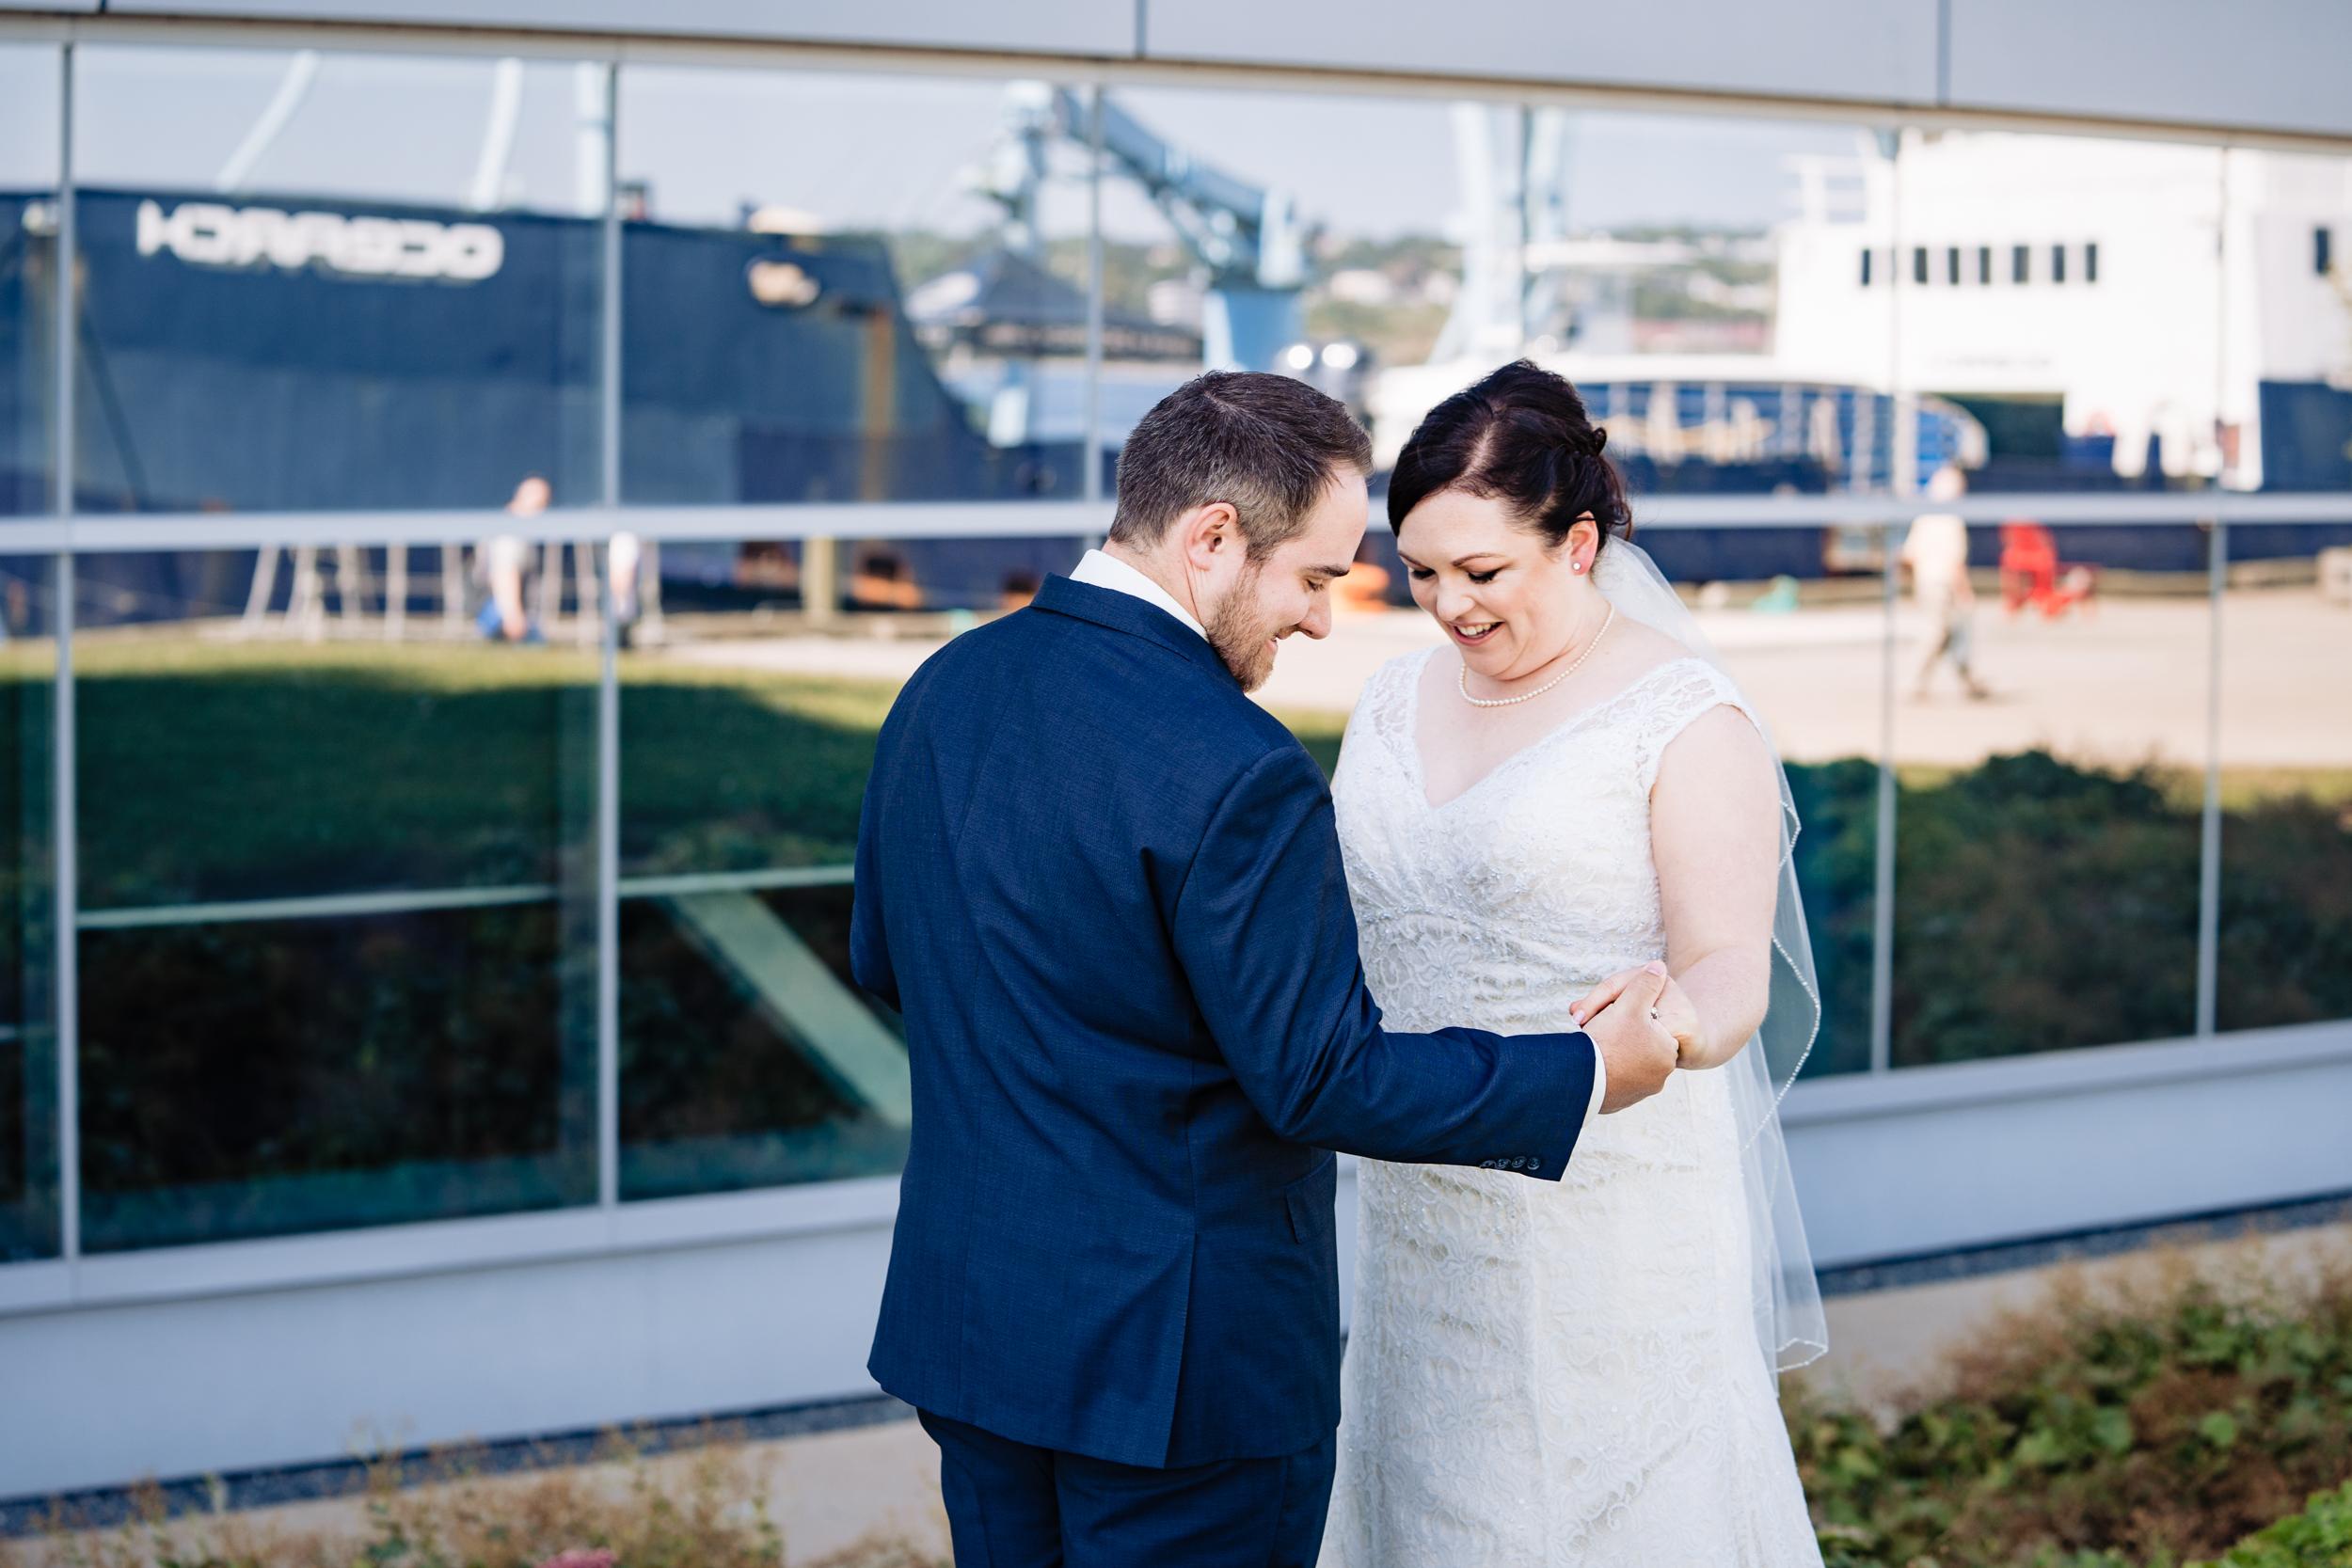 Halifax-wedding-photography-fall-photographers-novascotia-canada-ottawa (36 of 113).jpg